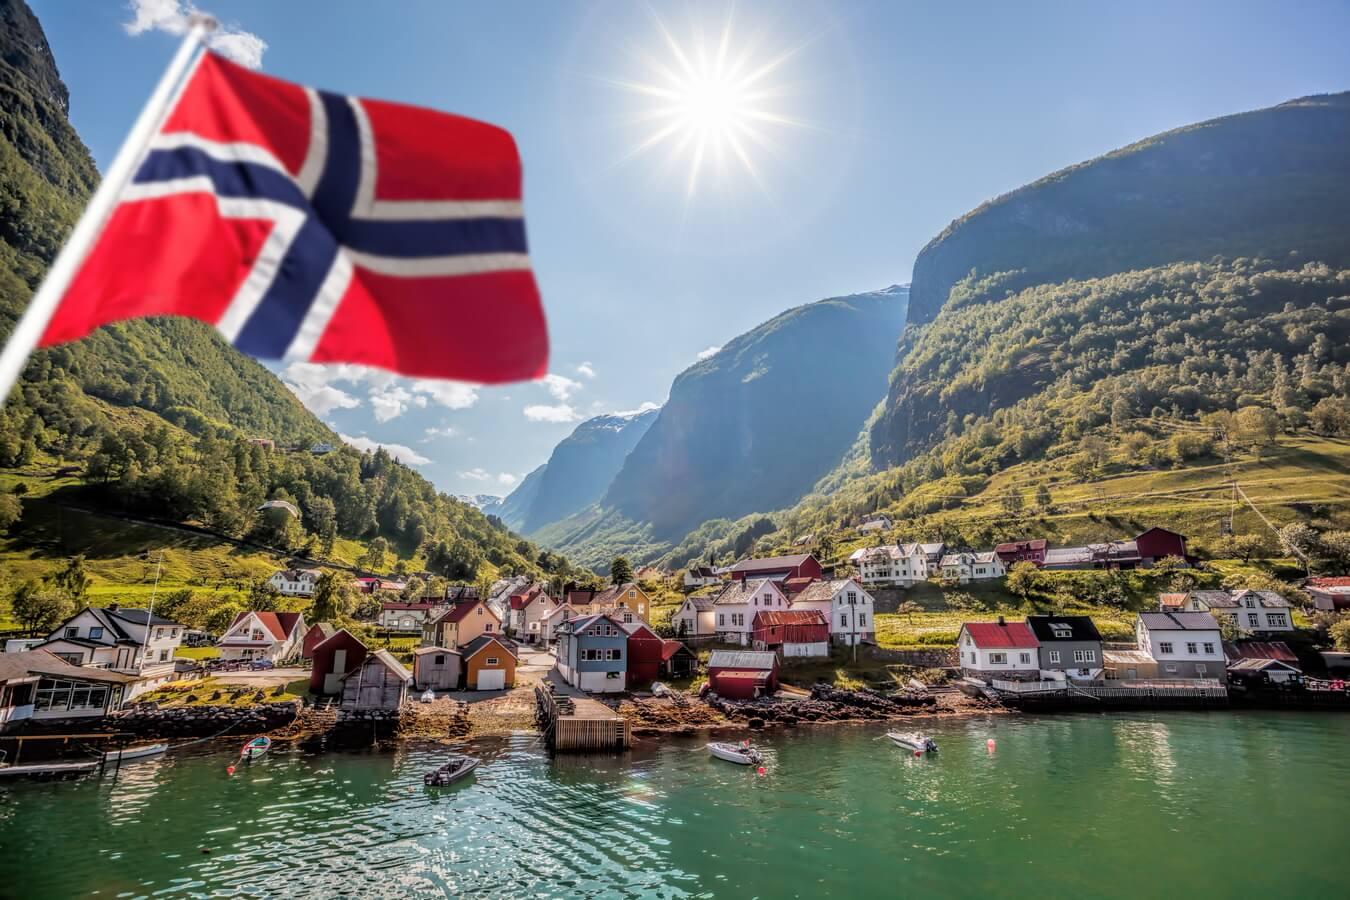 جزر لوفوتين / النرويج - Norway